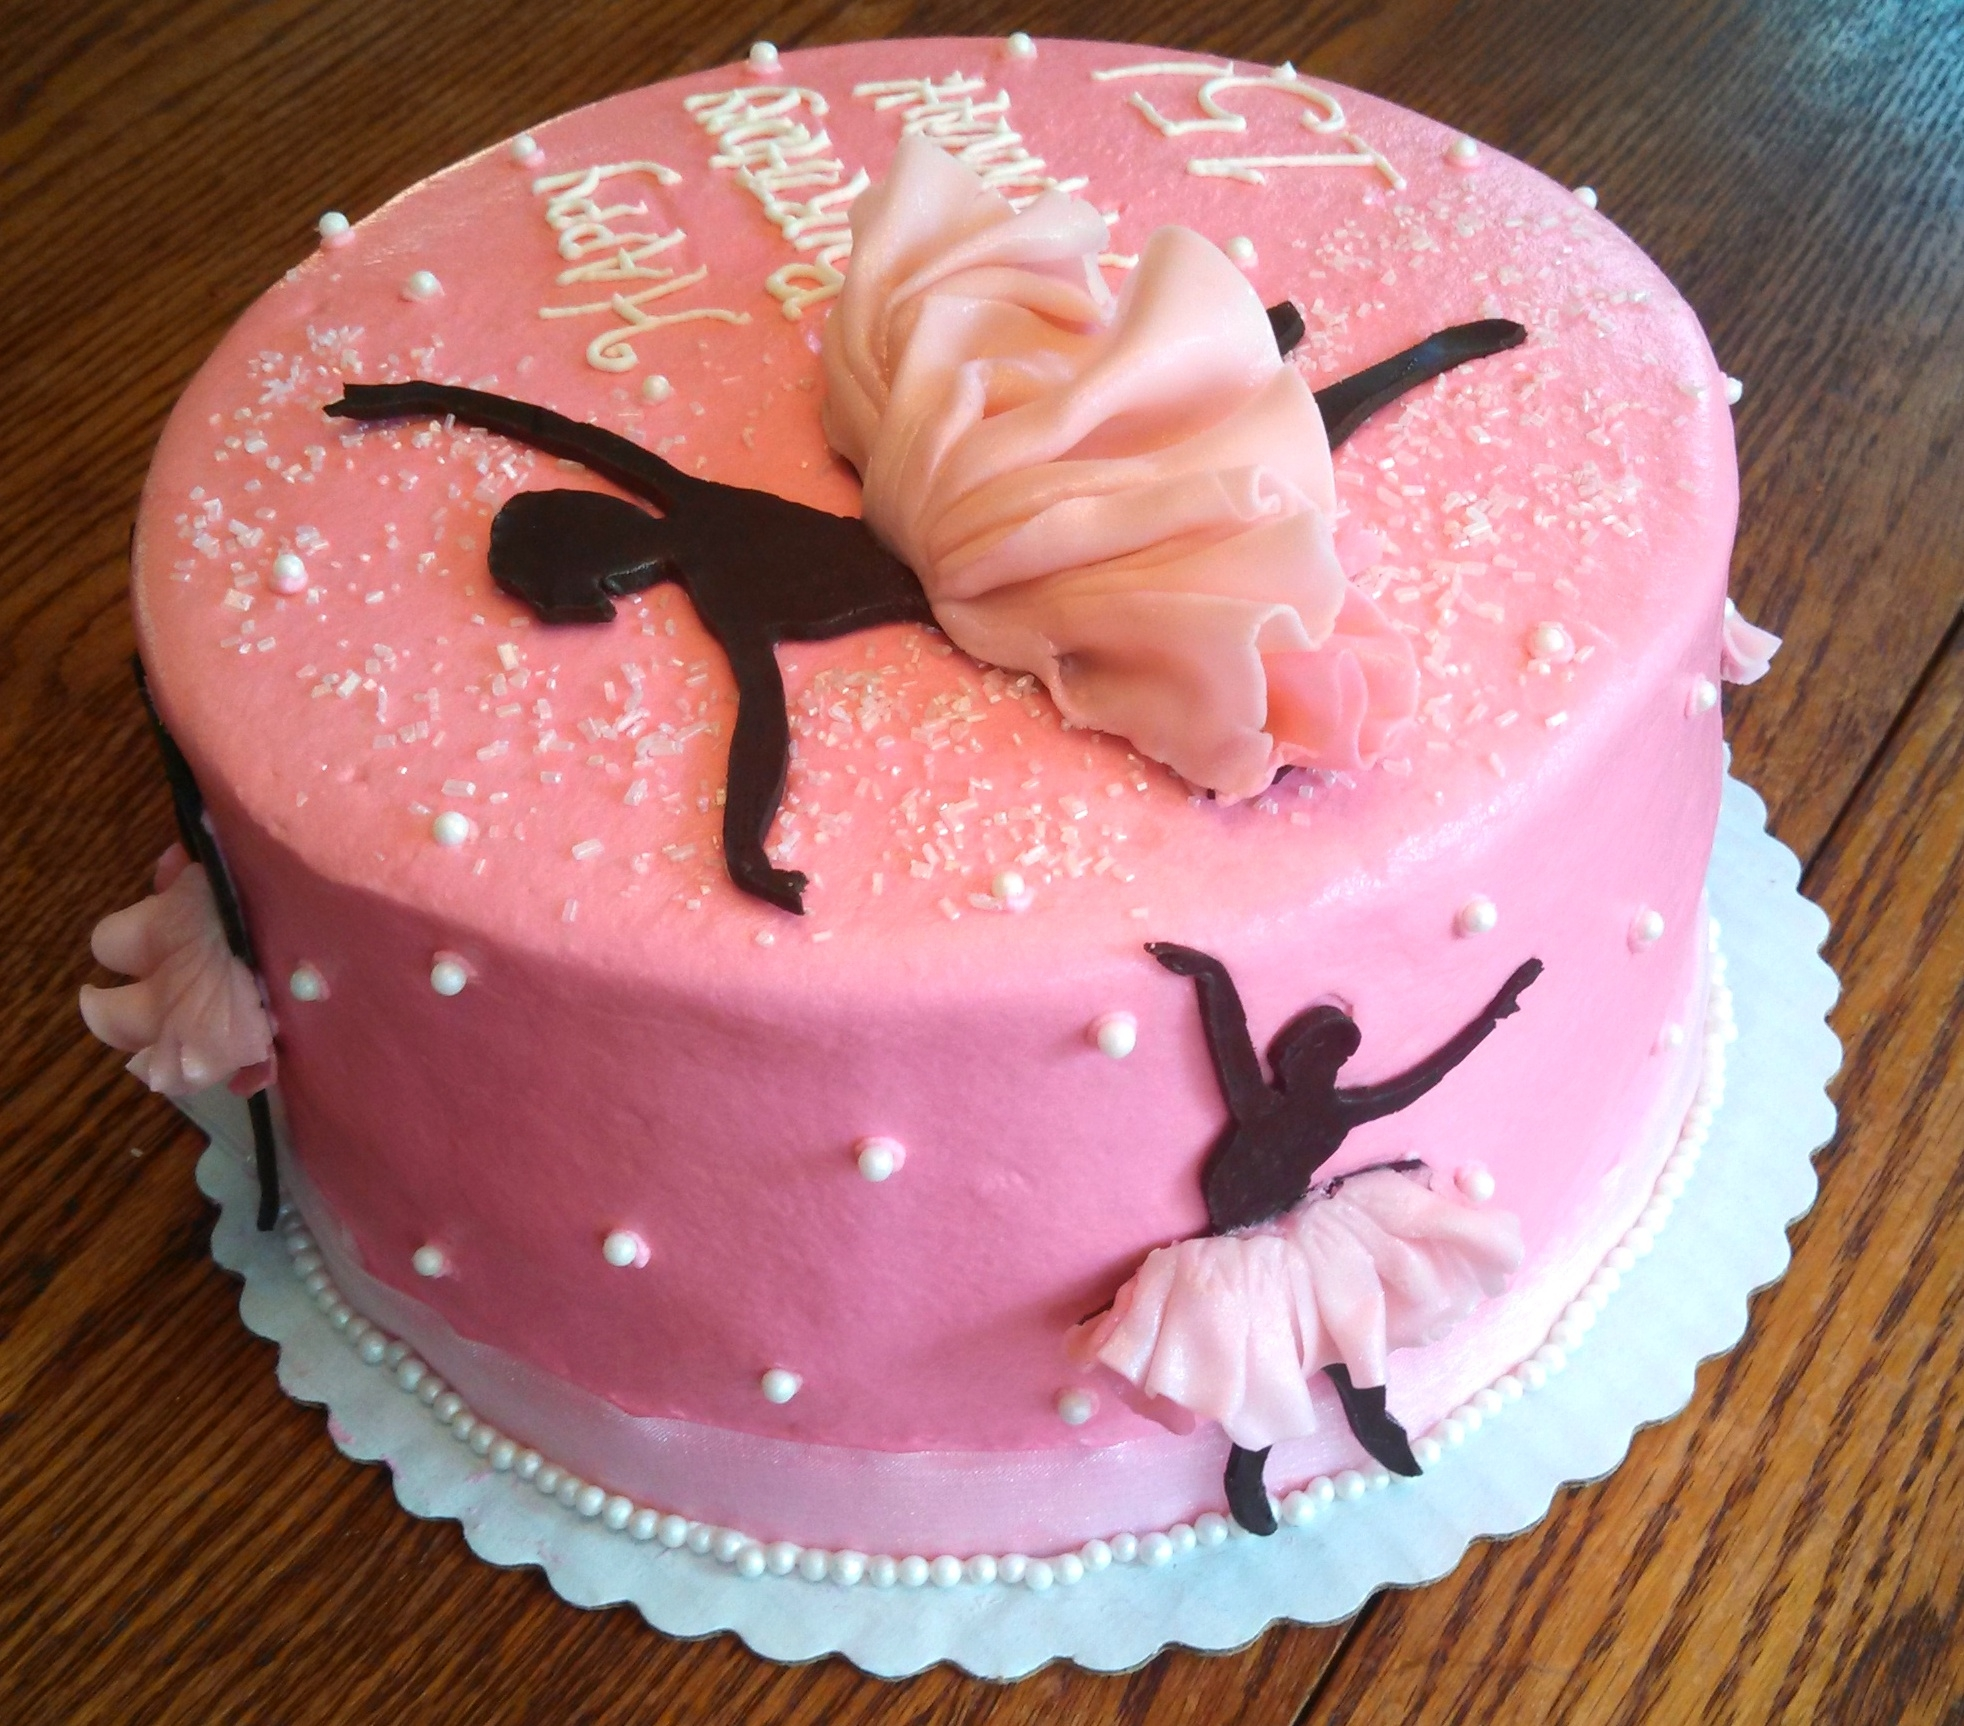 Inch Single Layer Cake